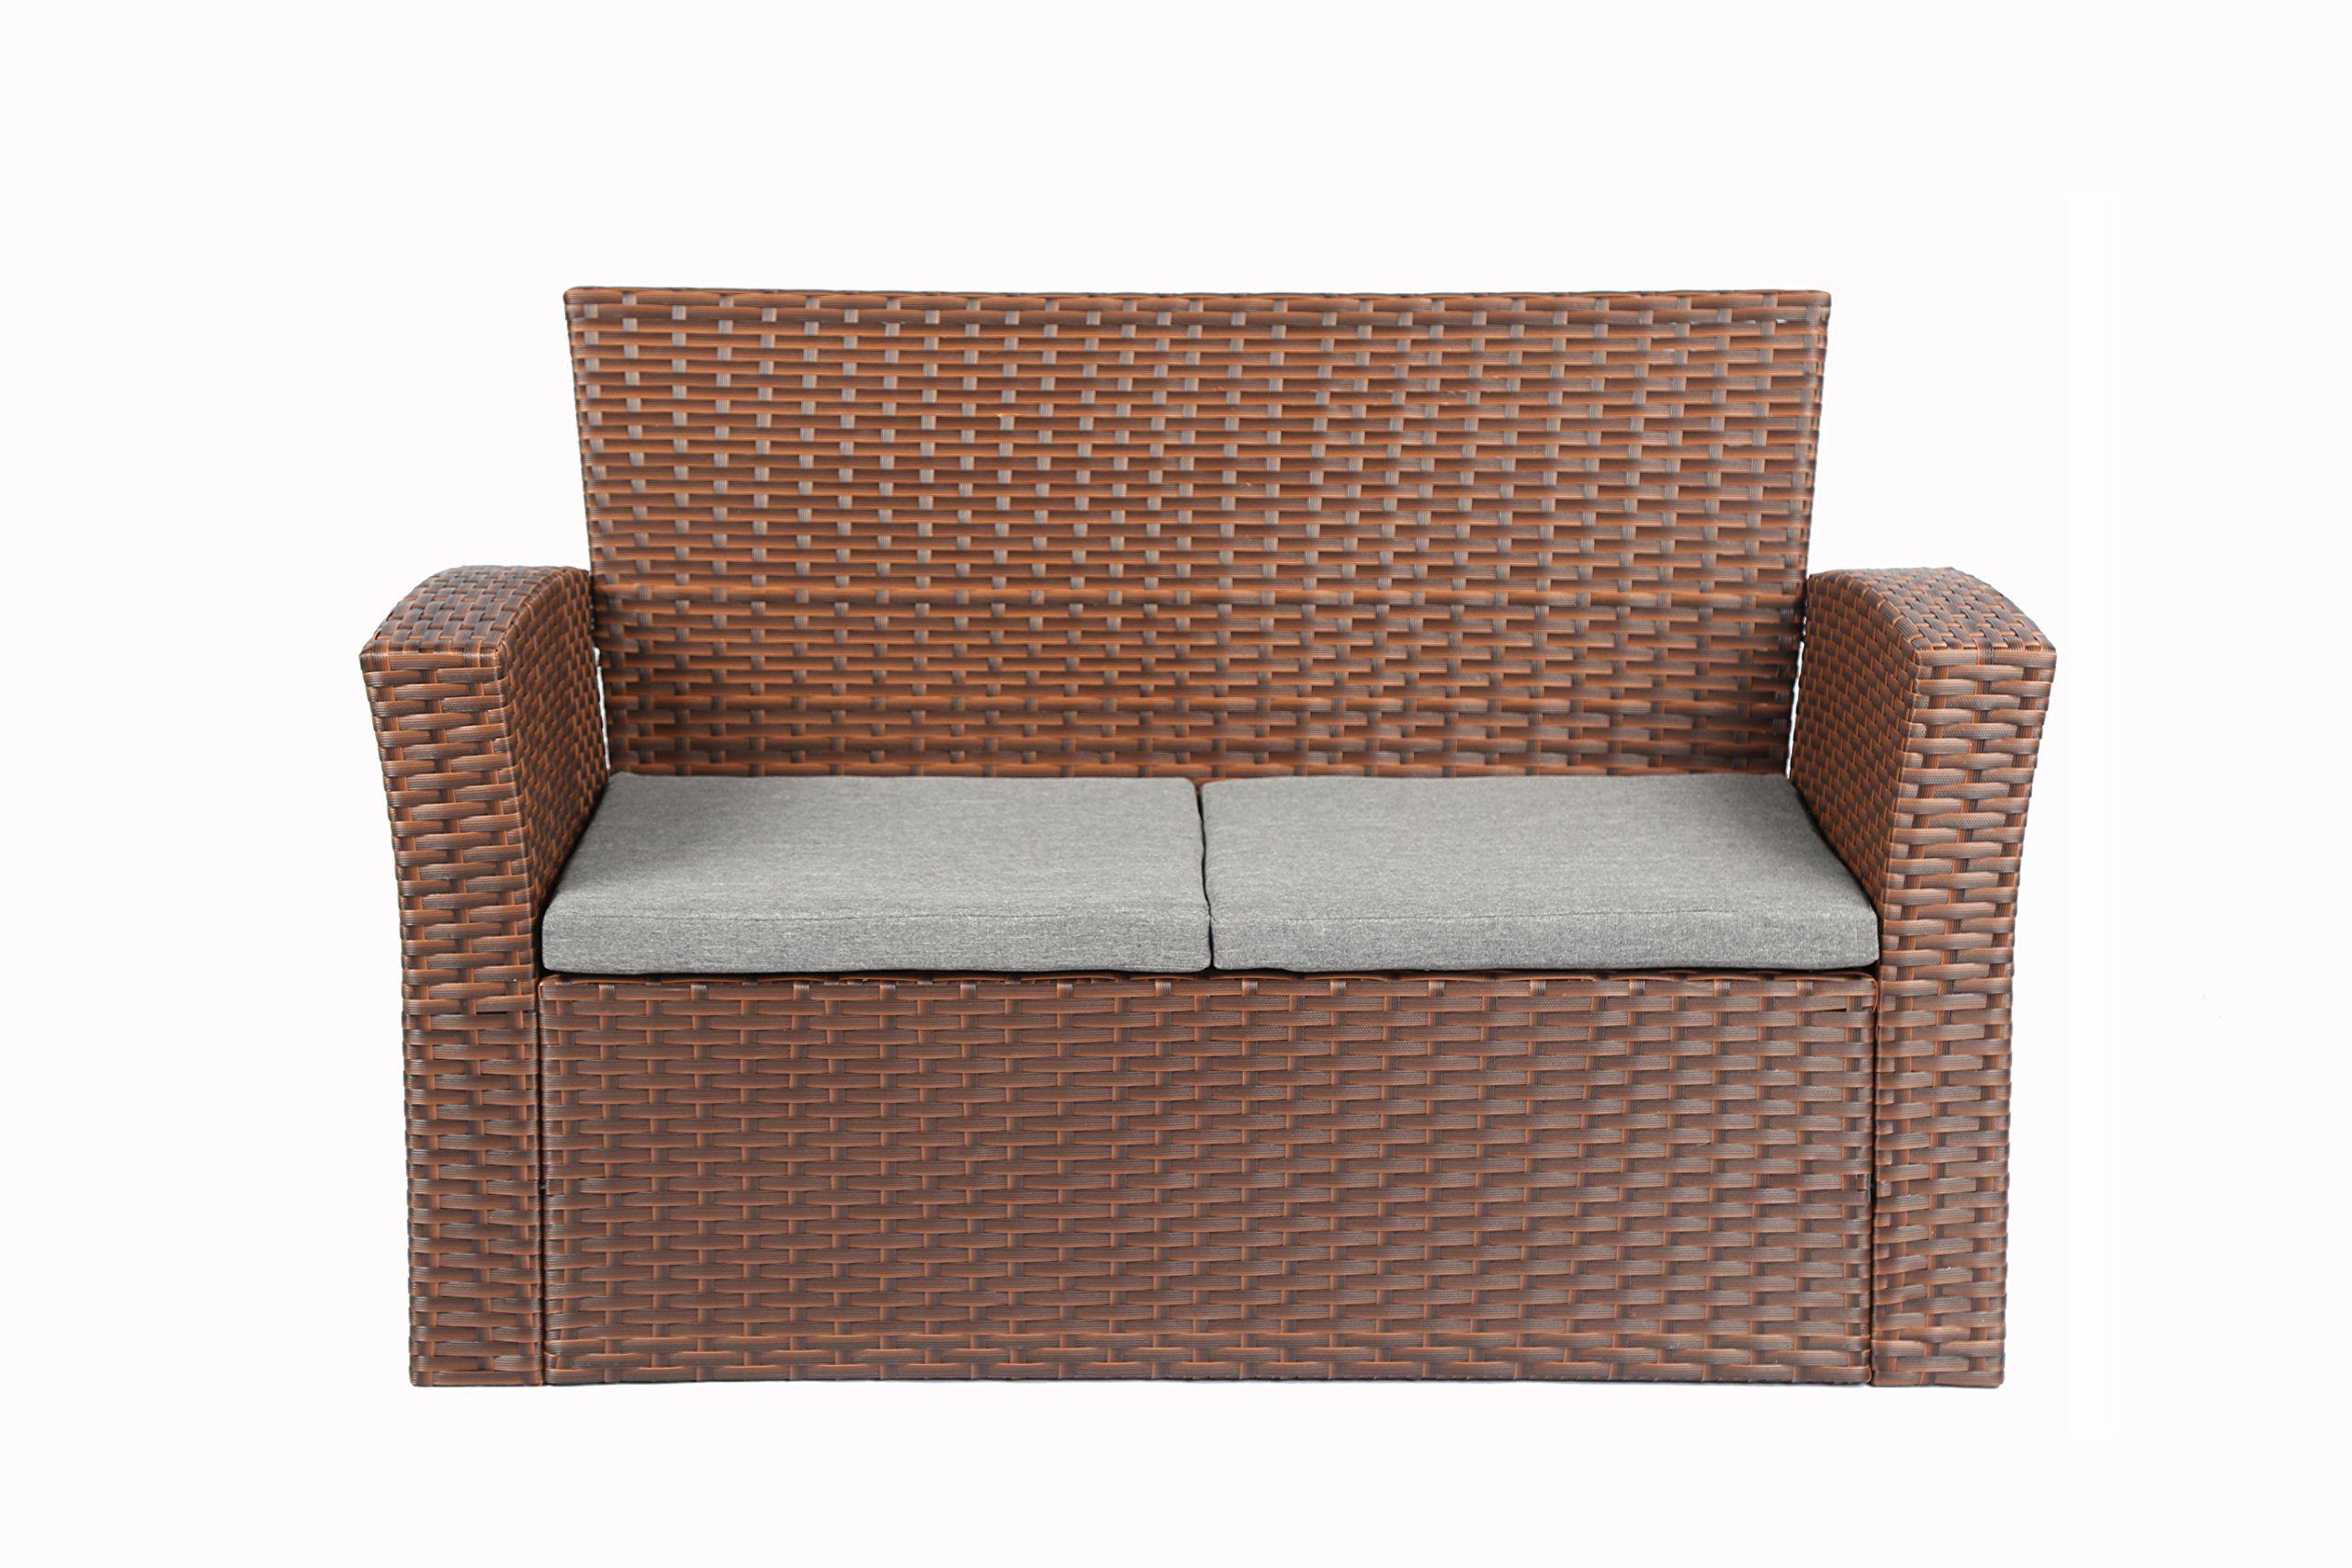 Baner garden nbr pieces conversational outdoor furniture